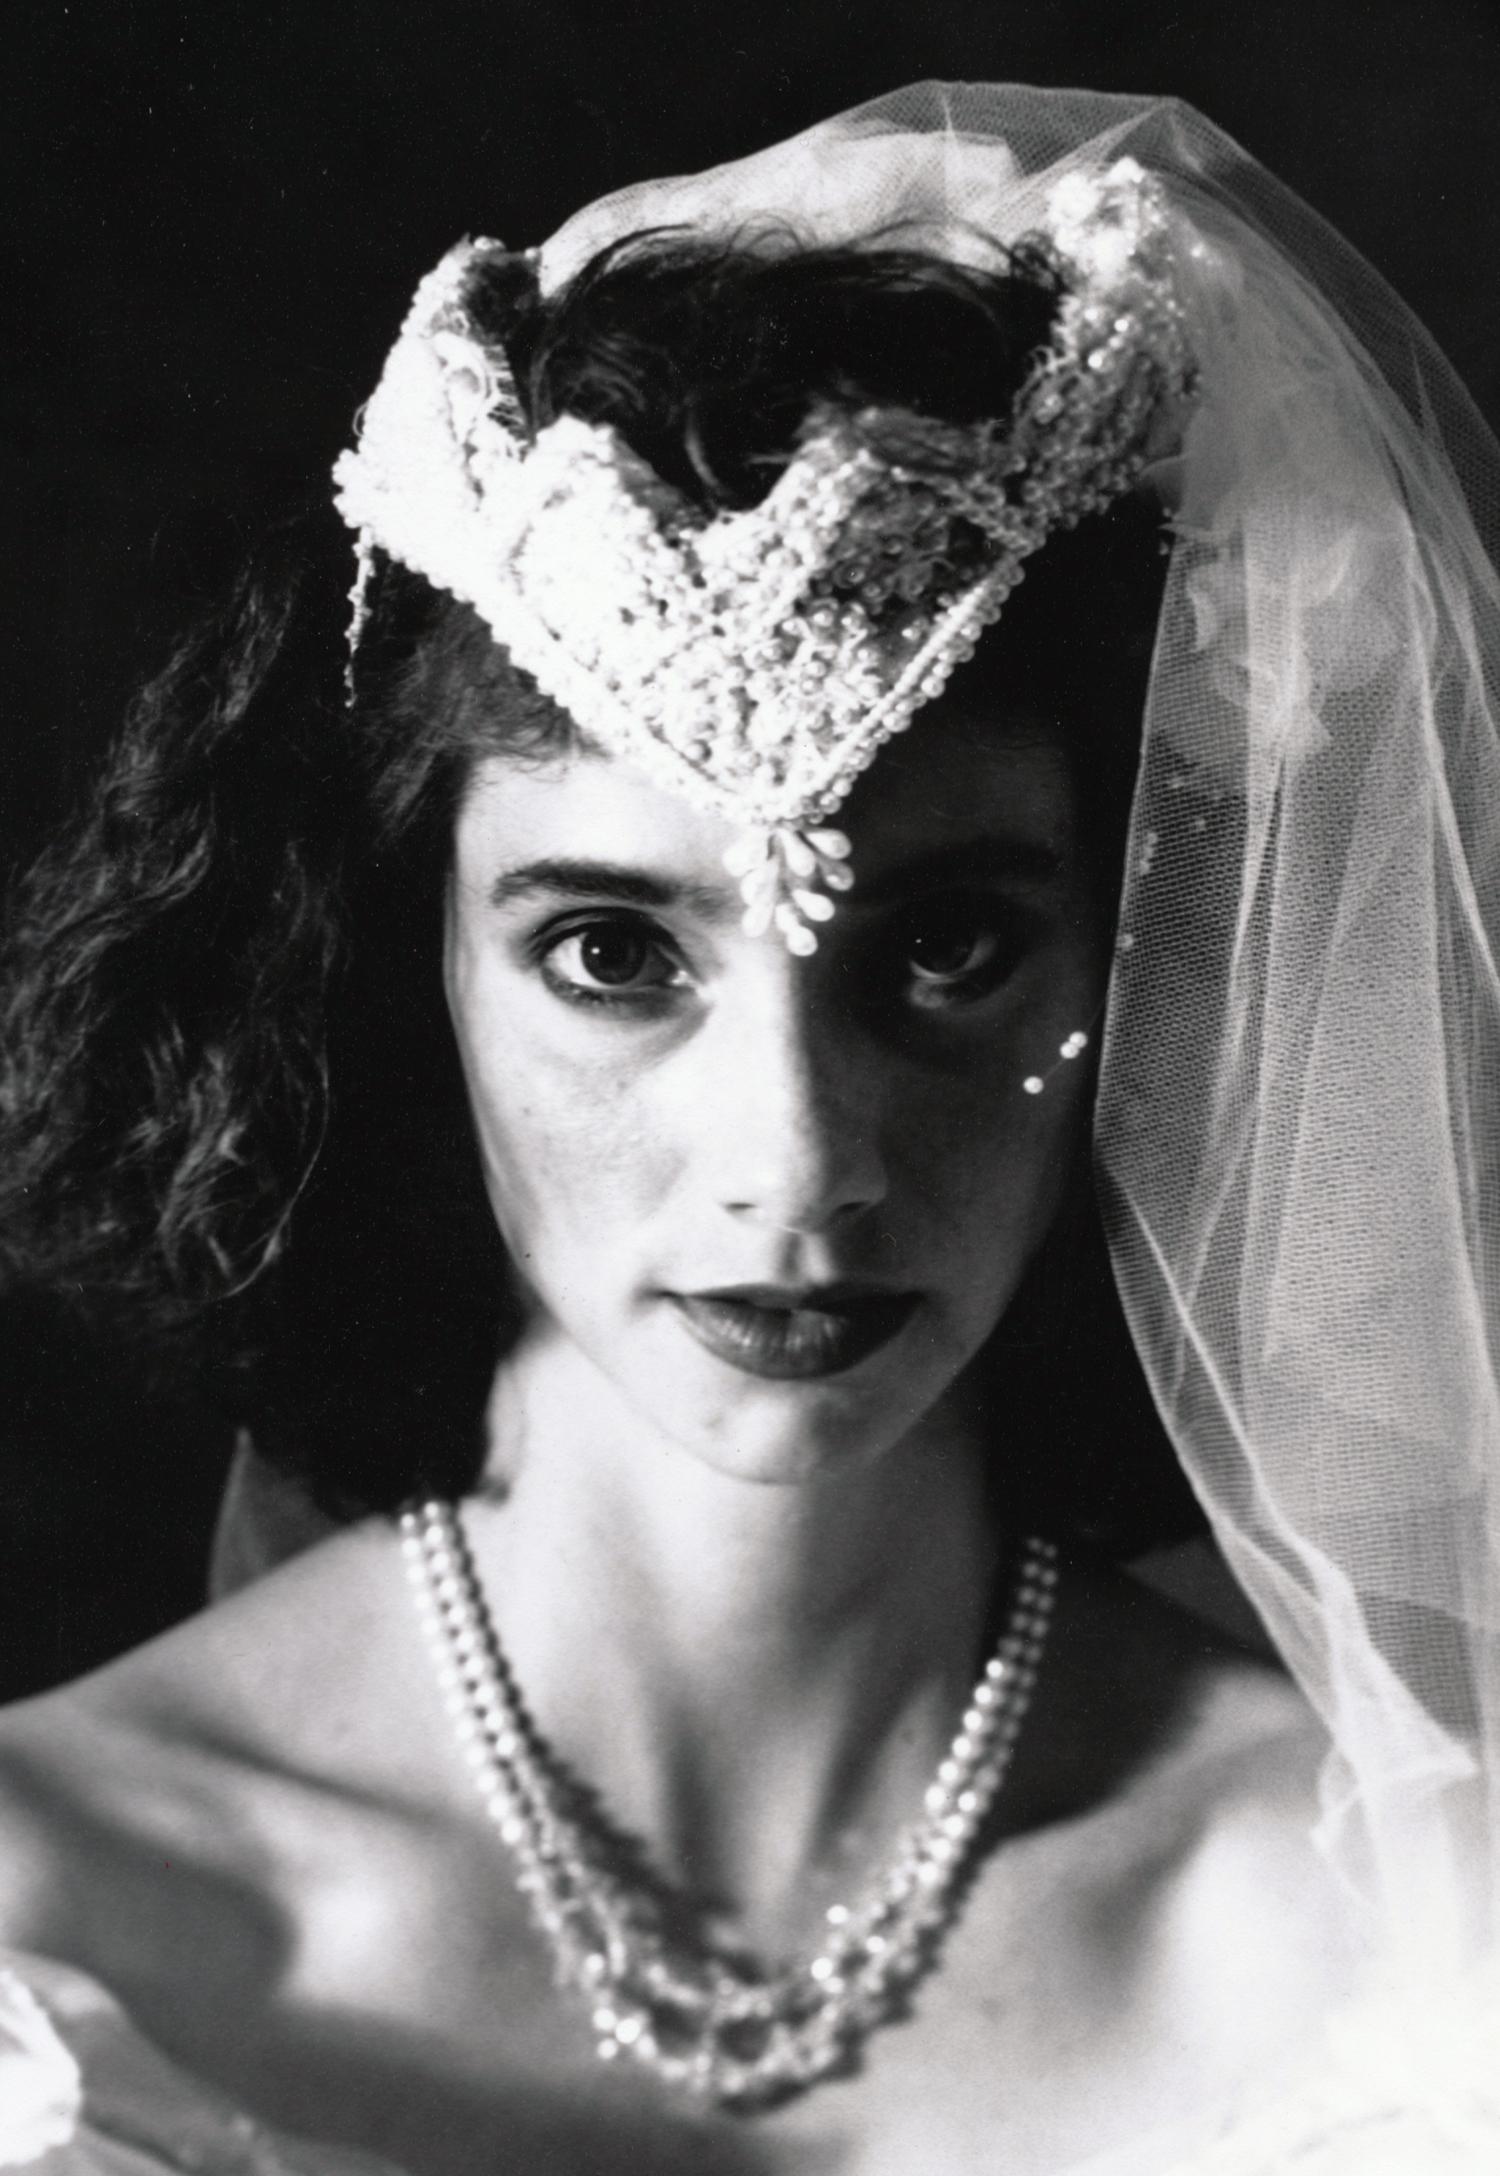 Teresa Wedding Series (detail)   4x5 silver print. © Jud Burgess 1989